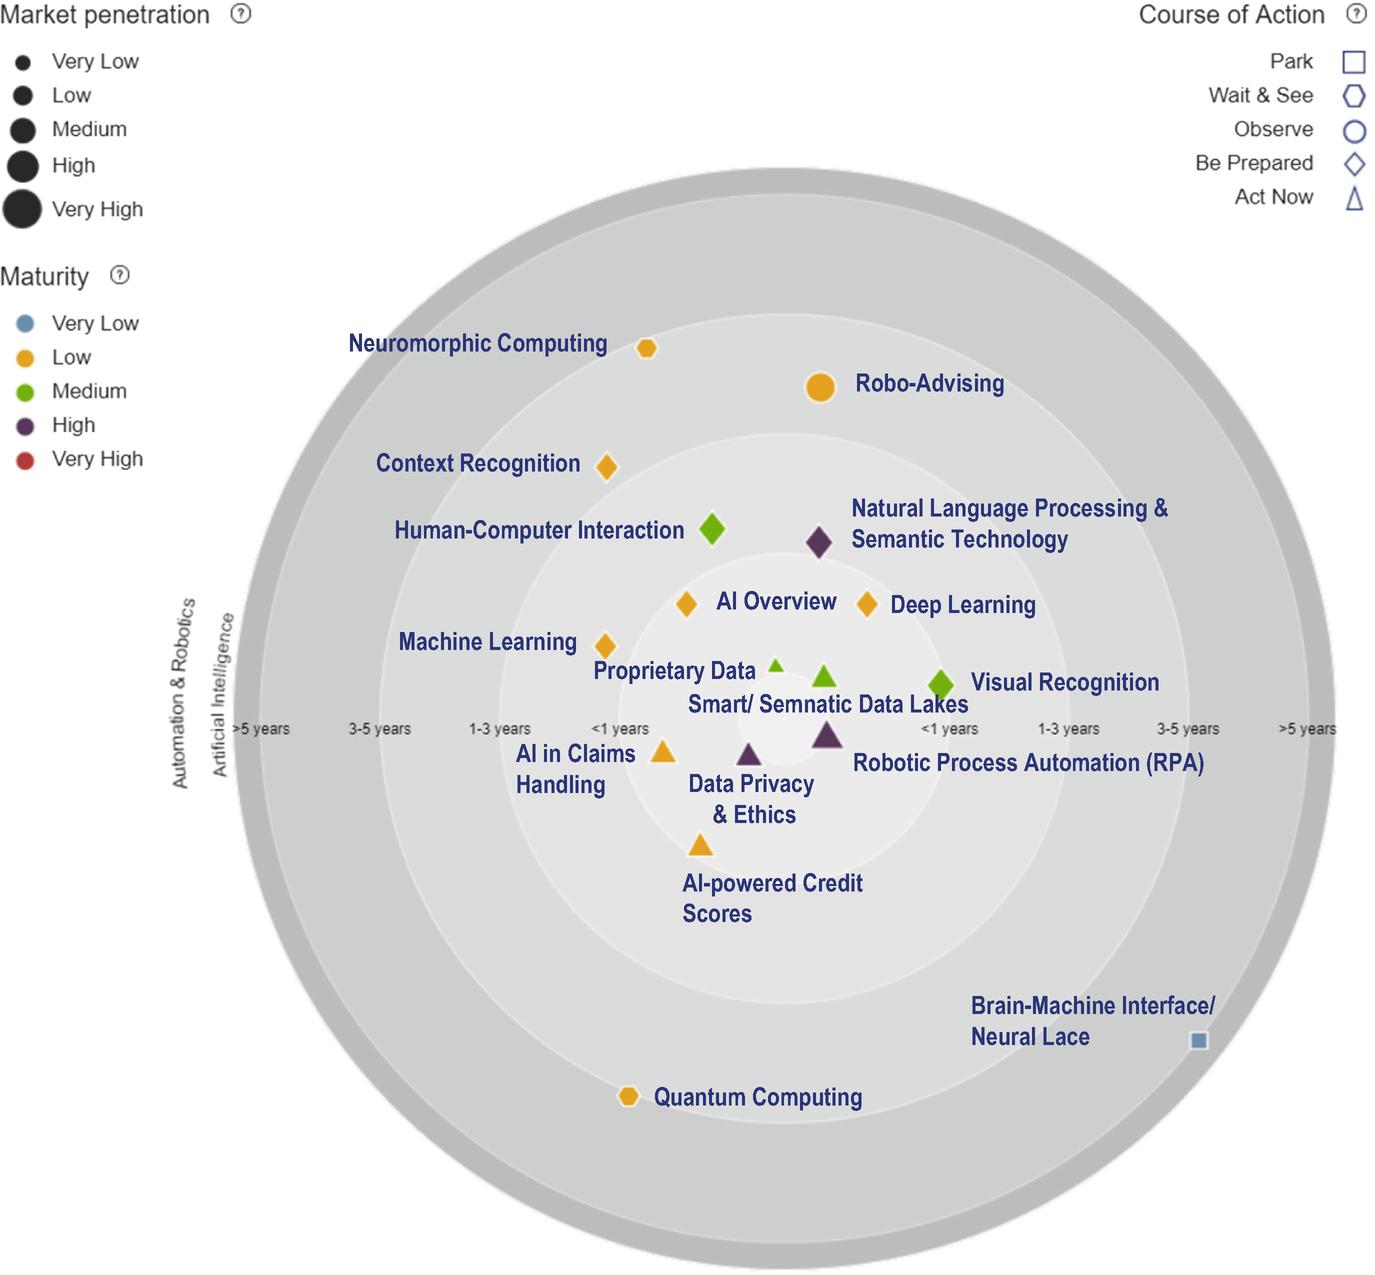 Successful Navigation Through Digital Transformation Using an